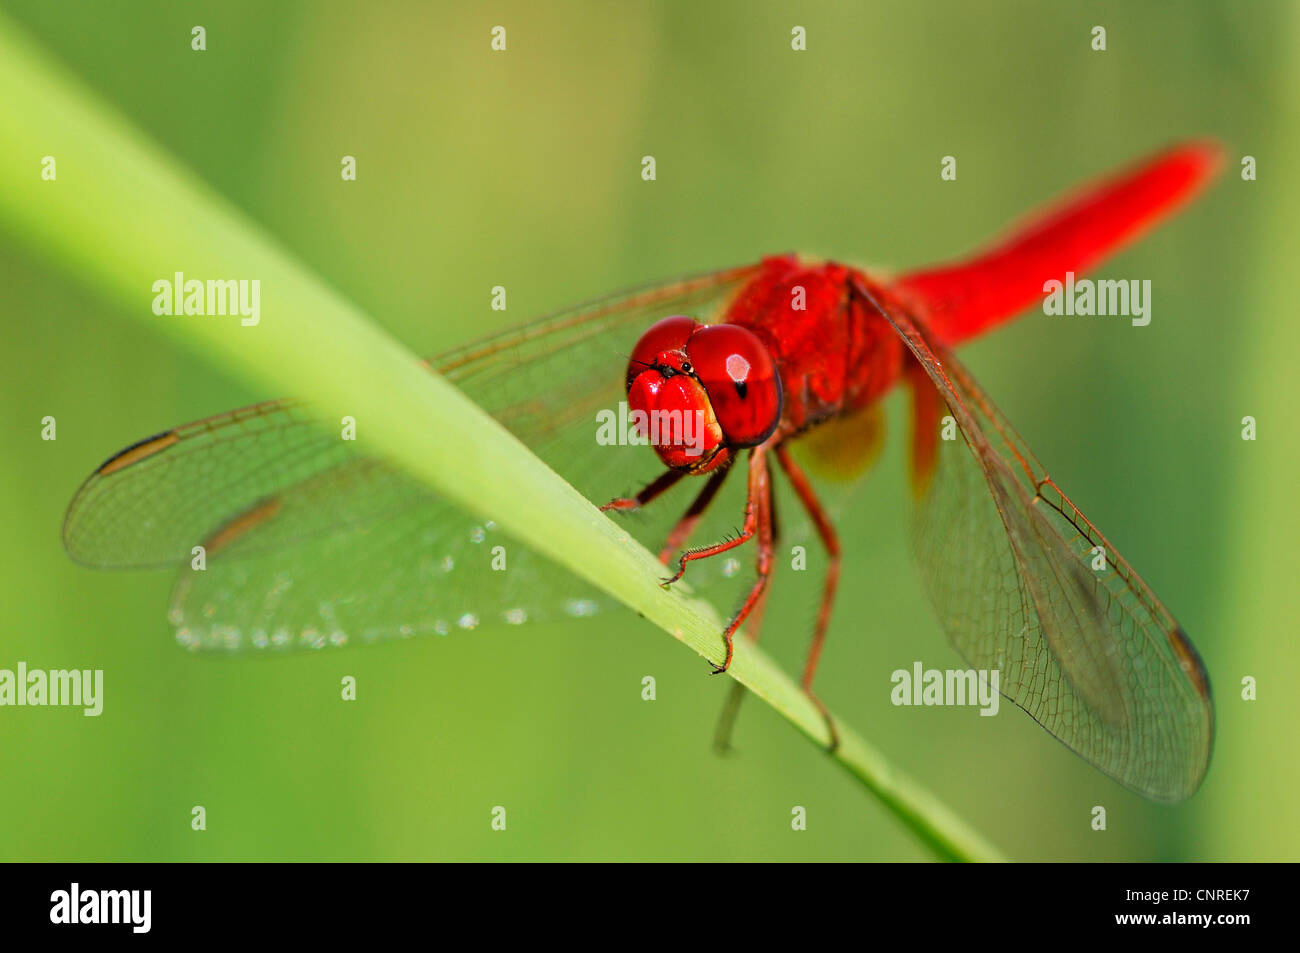 scarlet darter (Crocothemis erythraea), sitting on a green leaf, Egypt, Grosses Sandmeer Stock Photo